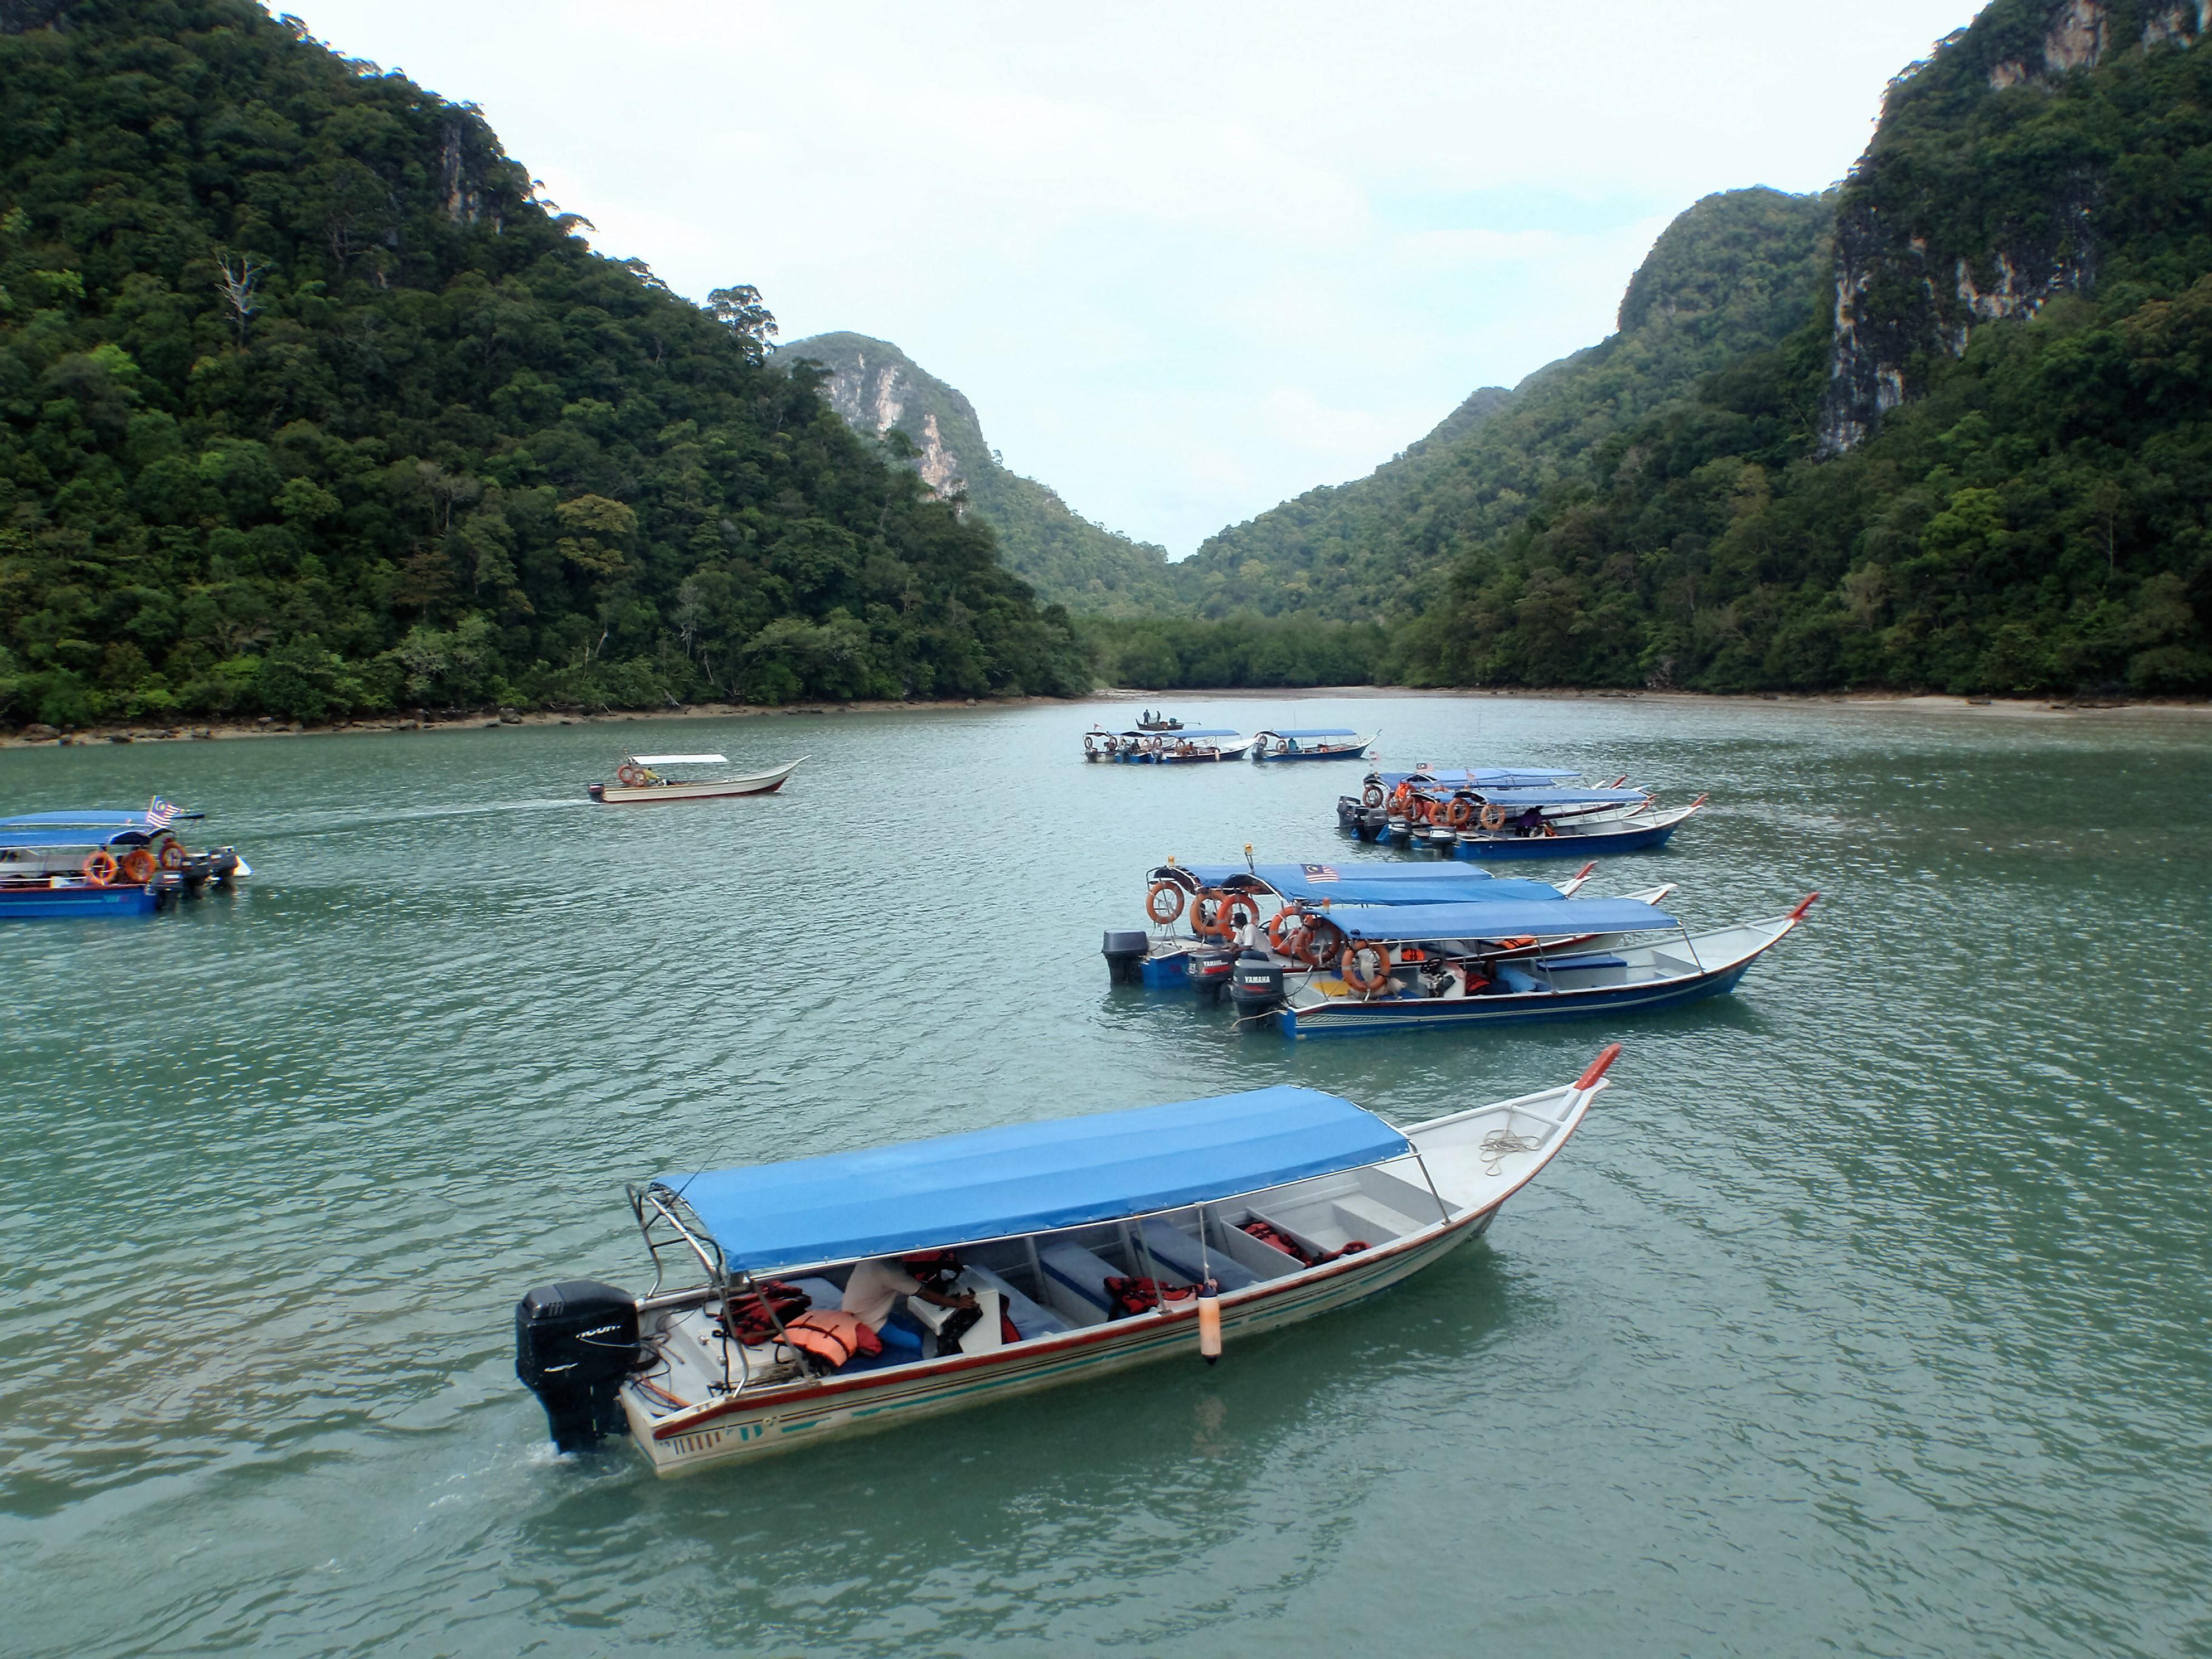 On the way to Dayang Bunting Island Langkawi